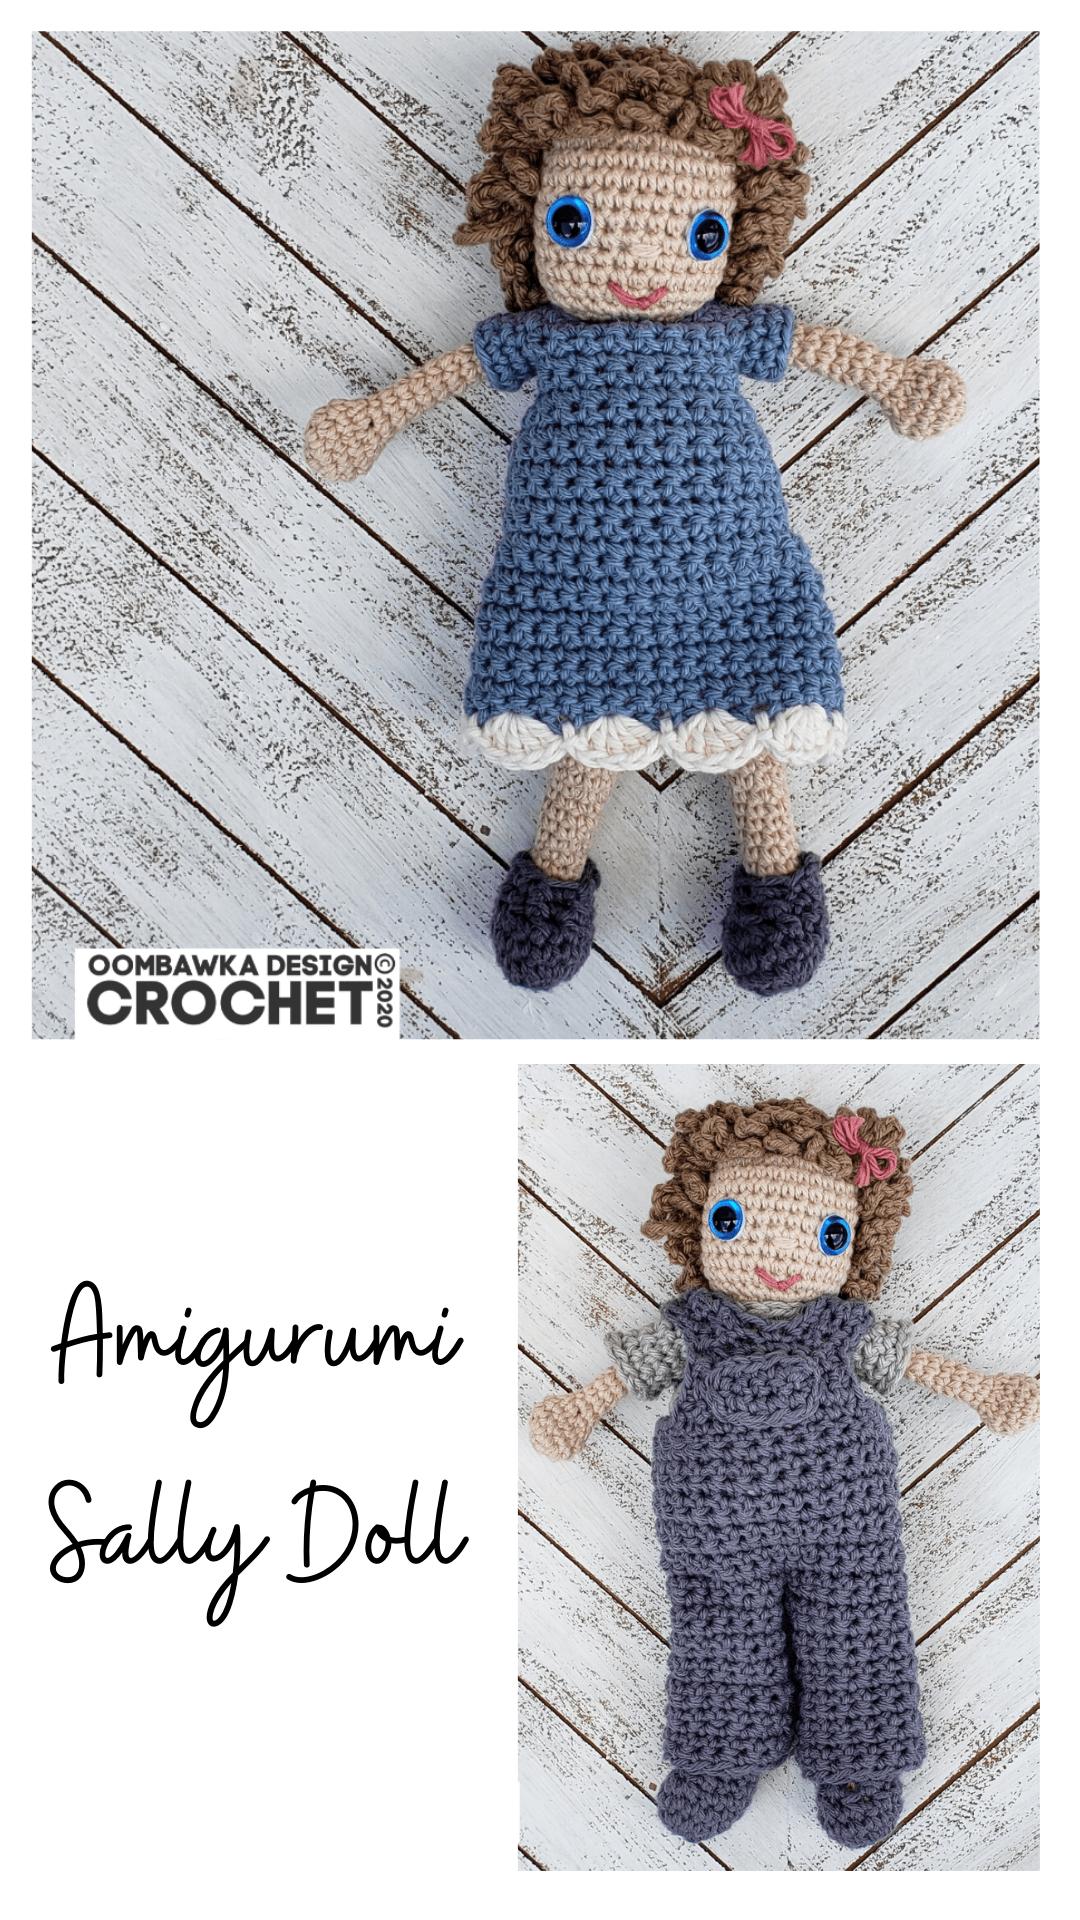 Amigurumi Sally Crochet Doll Free Pattern